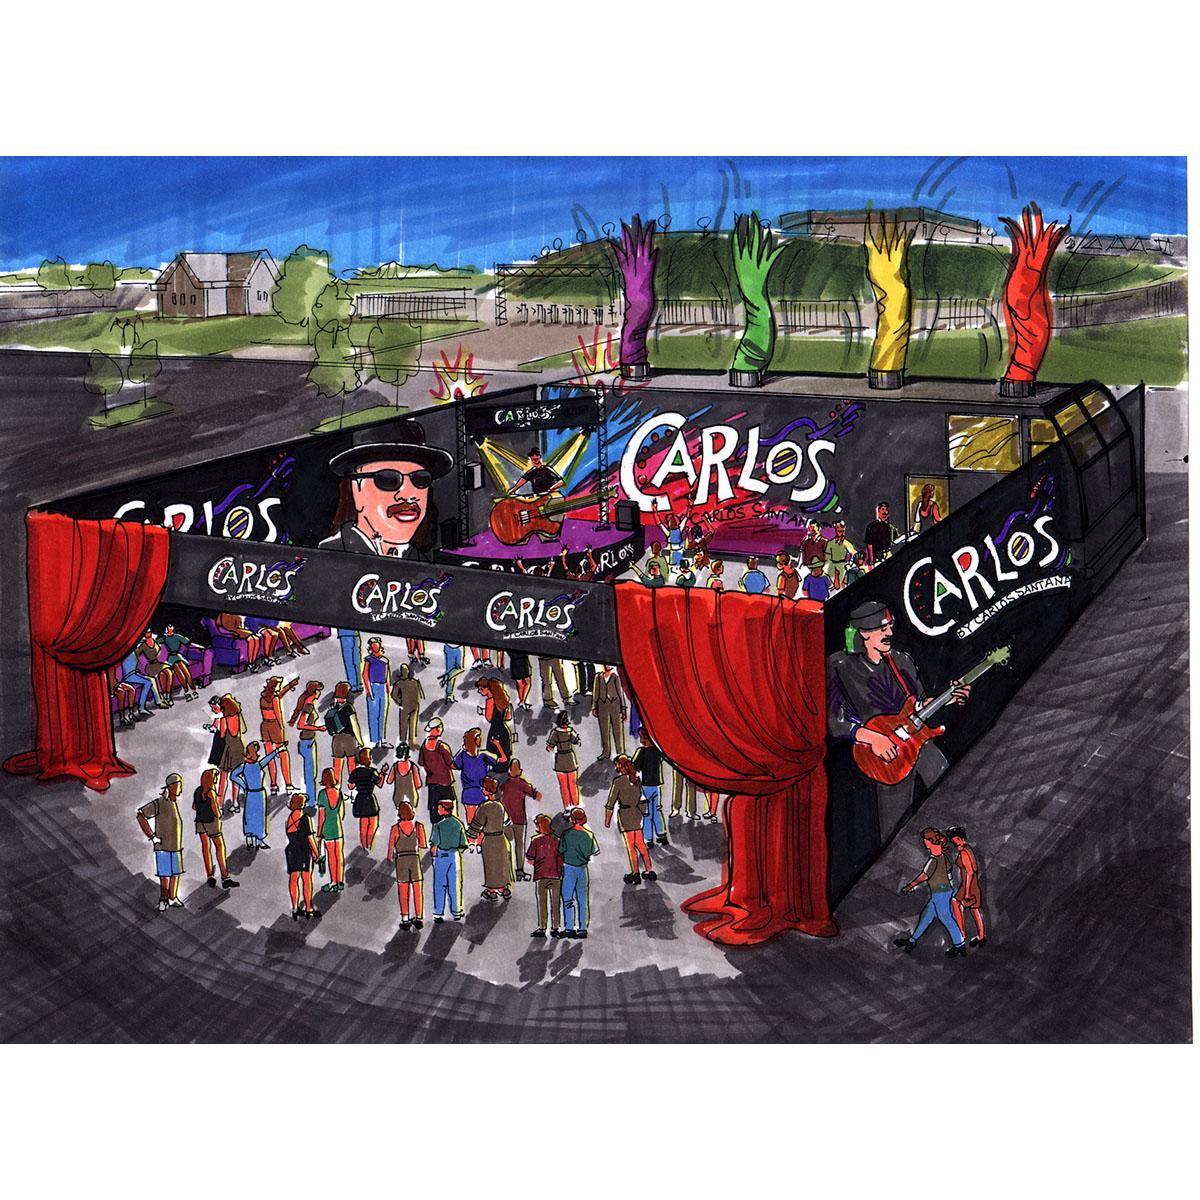 carlos-santana-event-marker